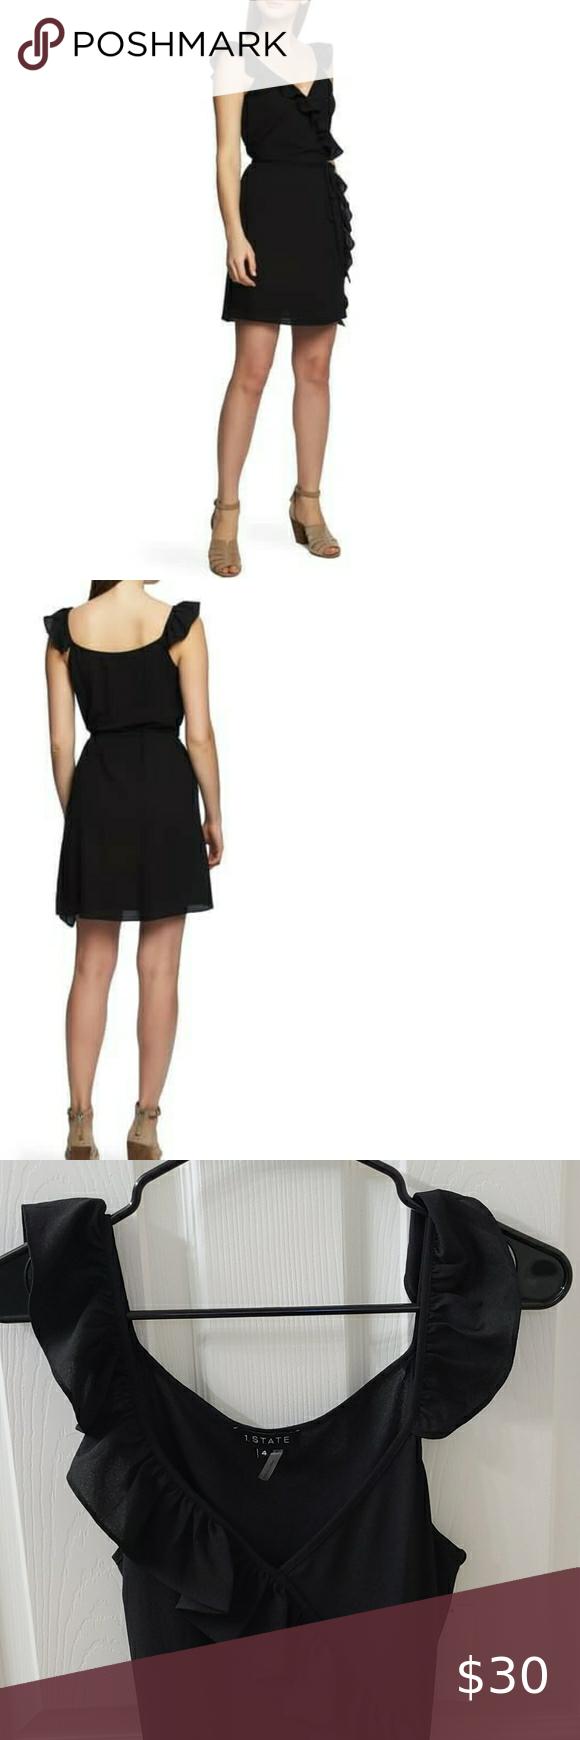 2 25 1 State Ruffle Wrap Dress Black Black Ruffle Sleeve Dress From 1 State Wrap Front Style Ruffle Detail Al Black Wrap Dress Ruffle Wrap Dress Wrap Dress [ 1740 x 580 Pixel ]